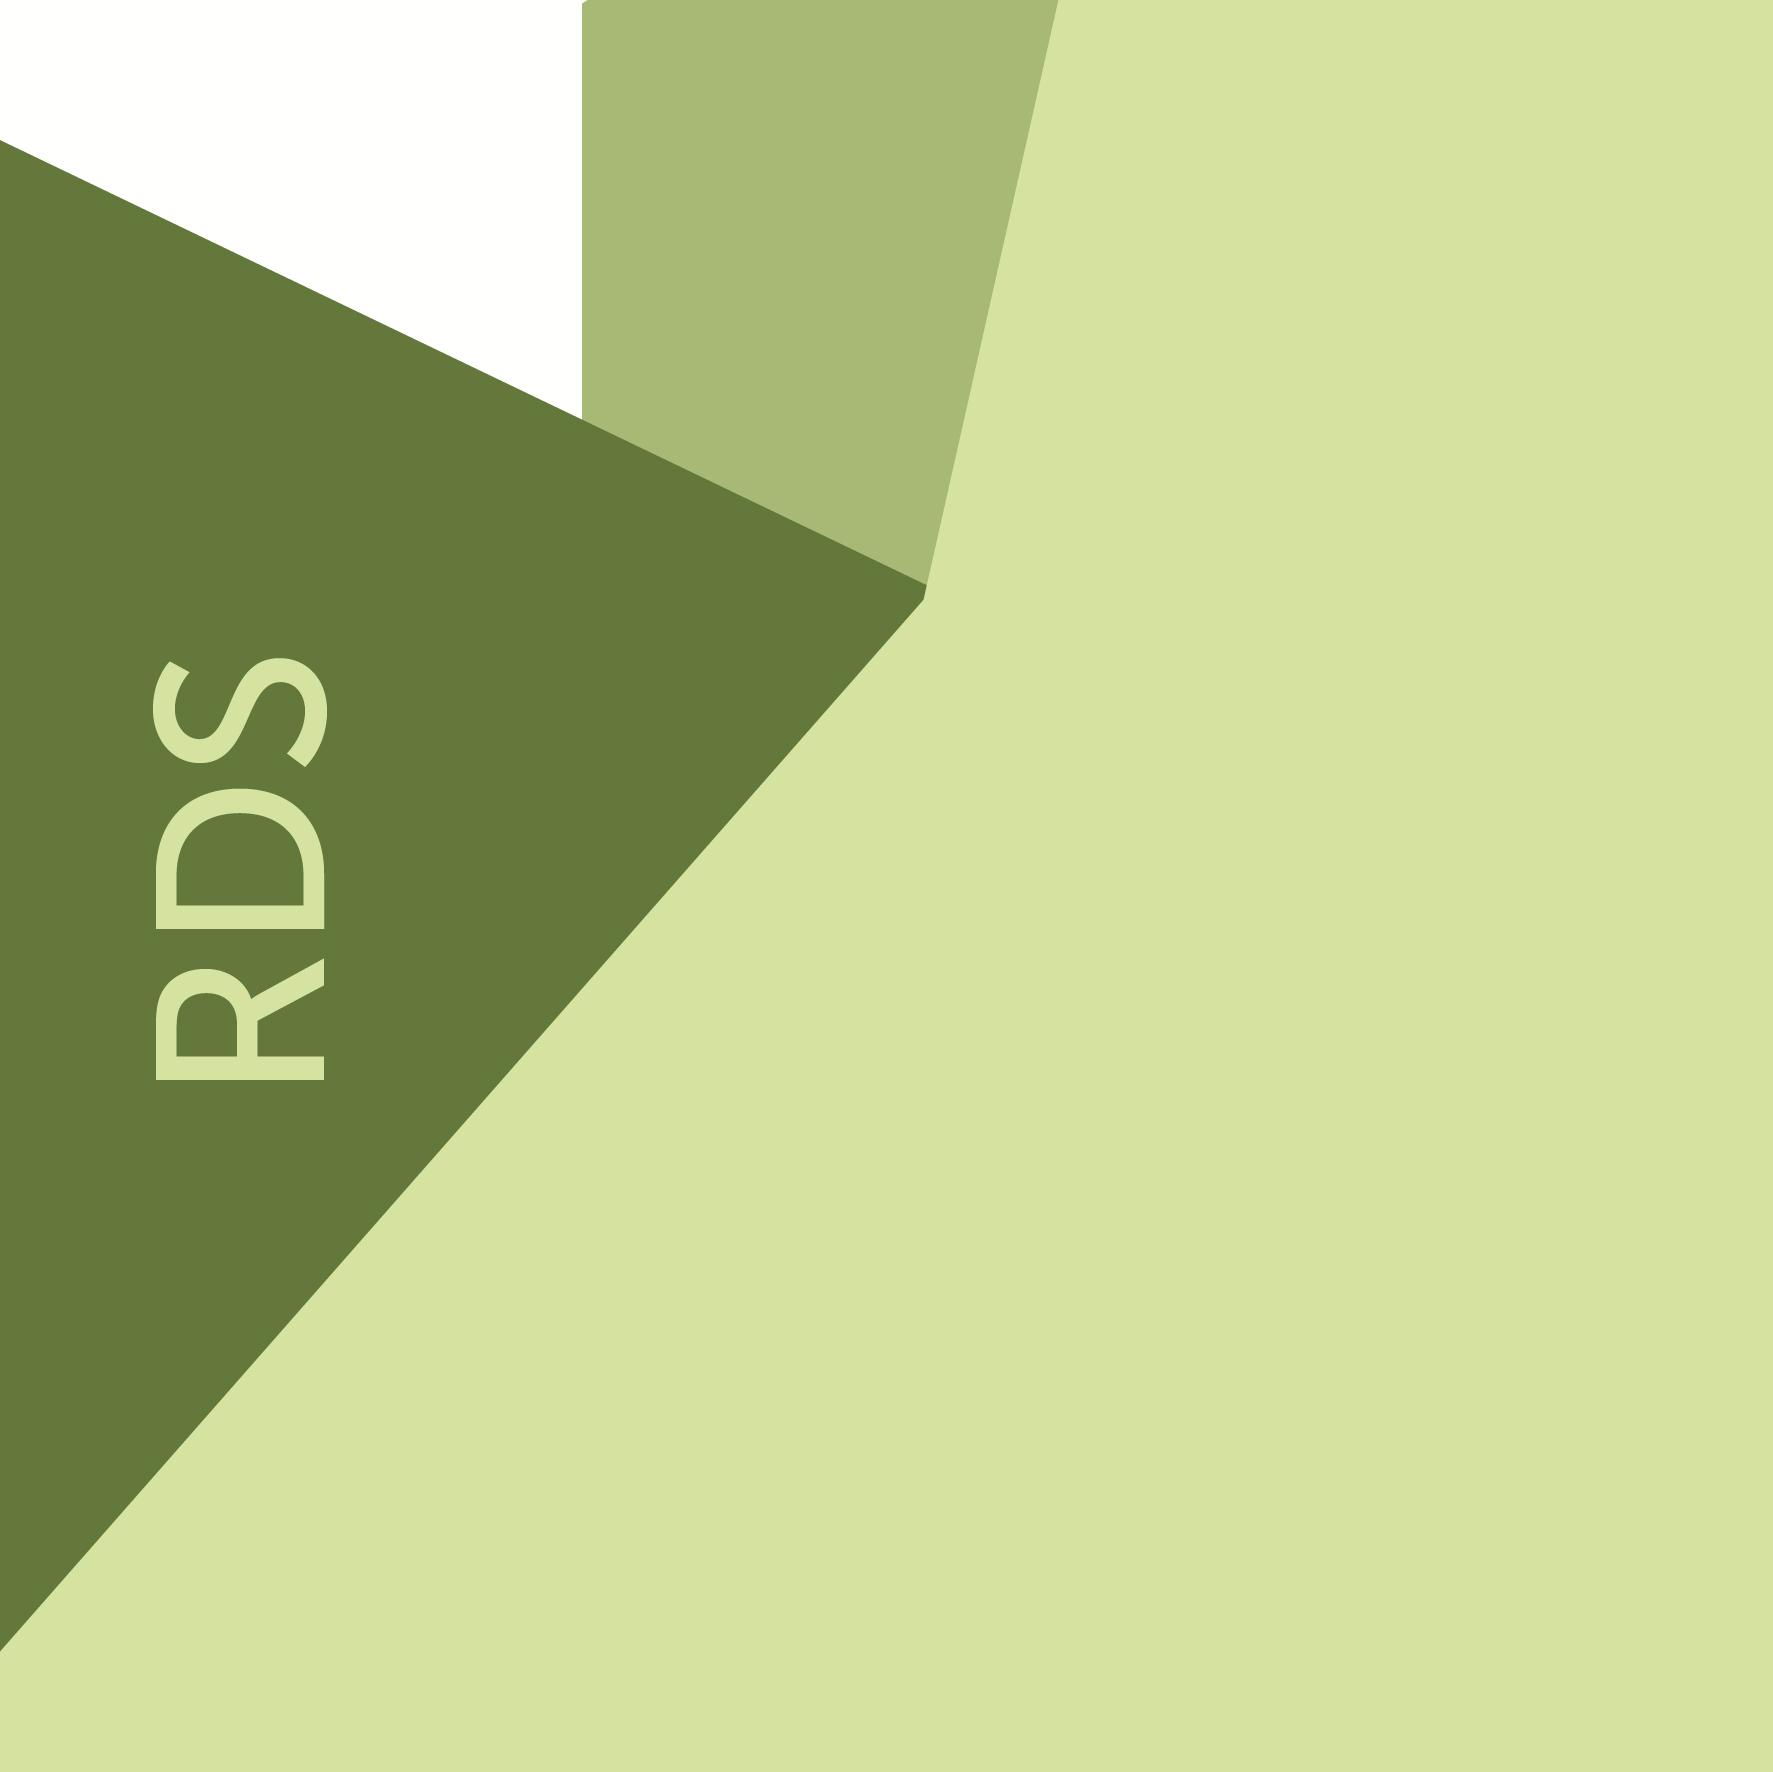 square logo-02.jpg